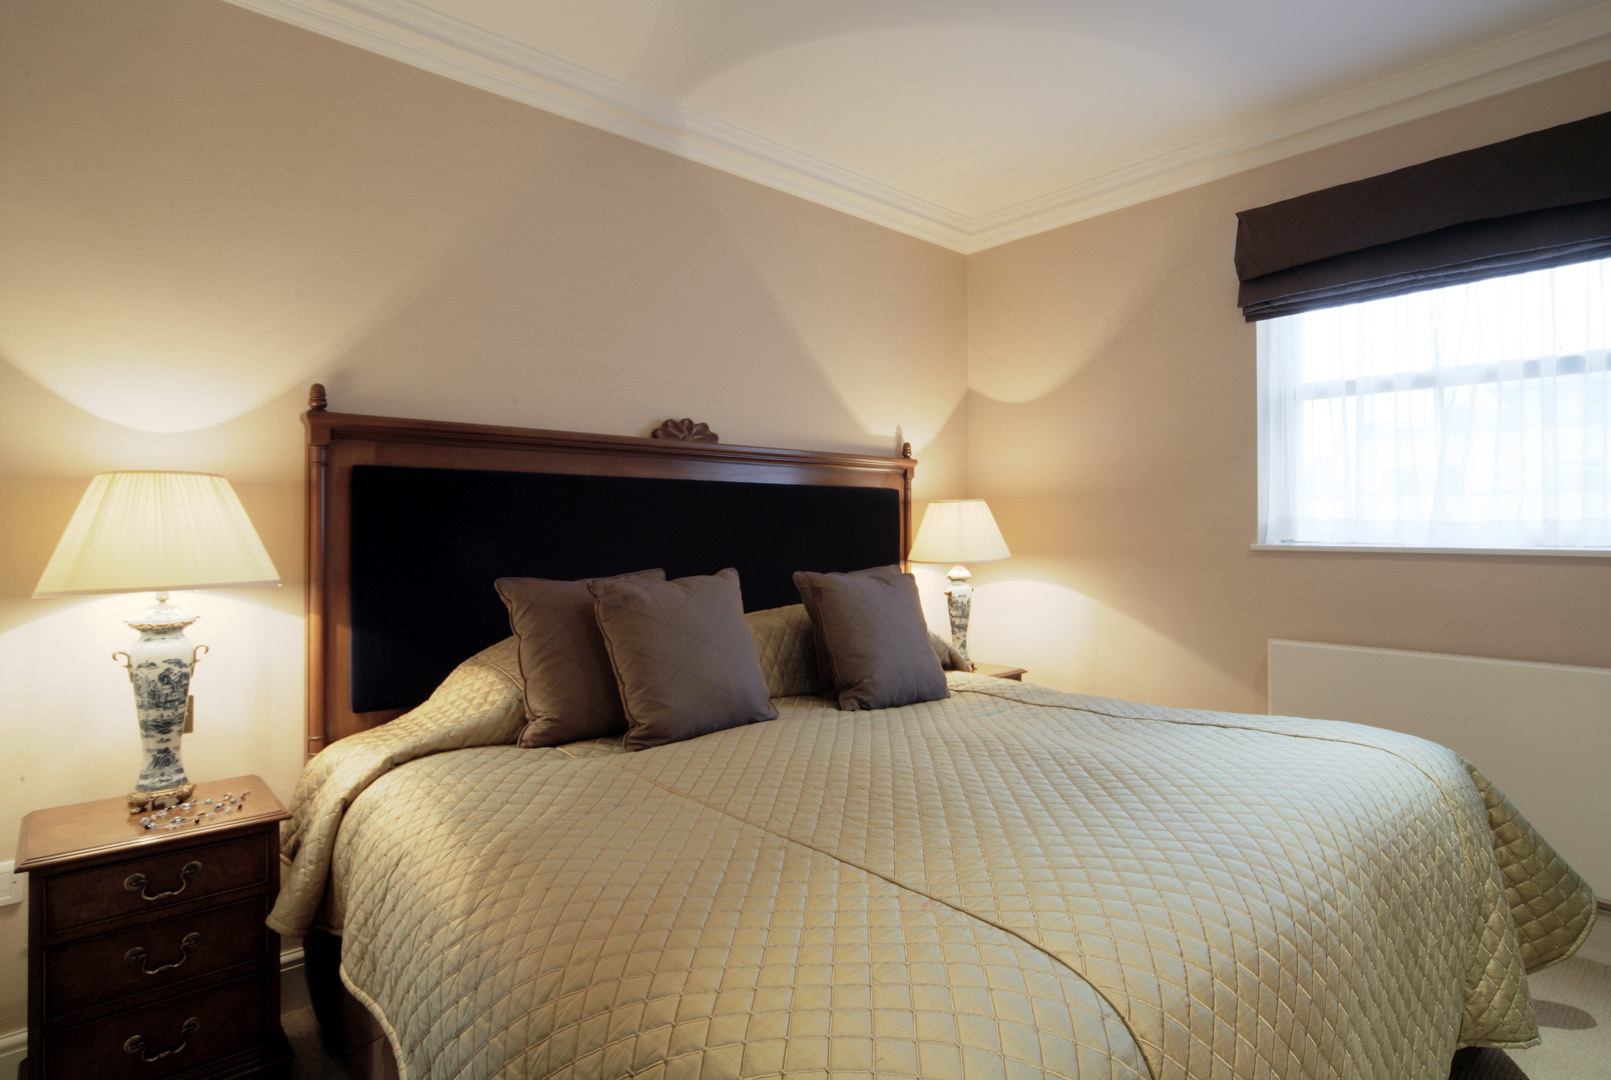 Bedroom at 148 Cheval Brompton Road, Knightsbridge, London